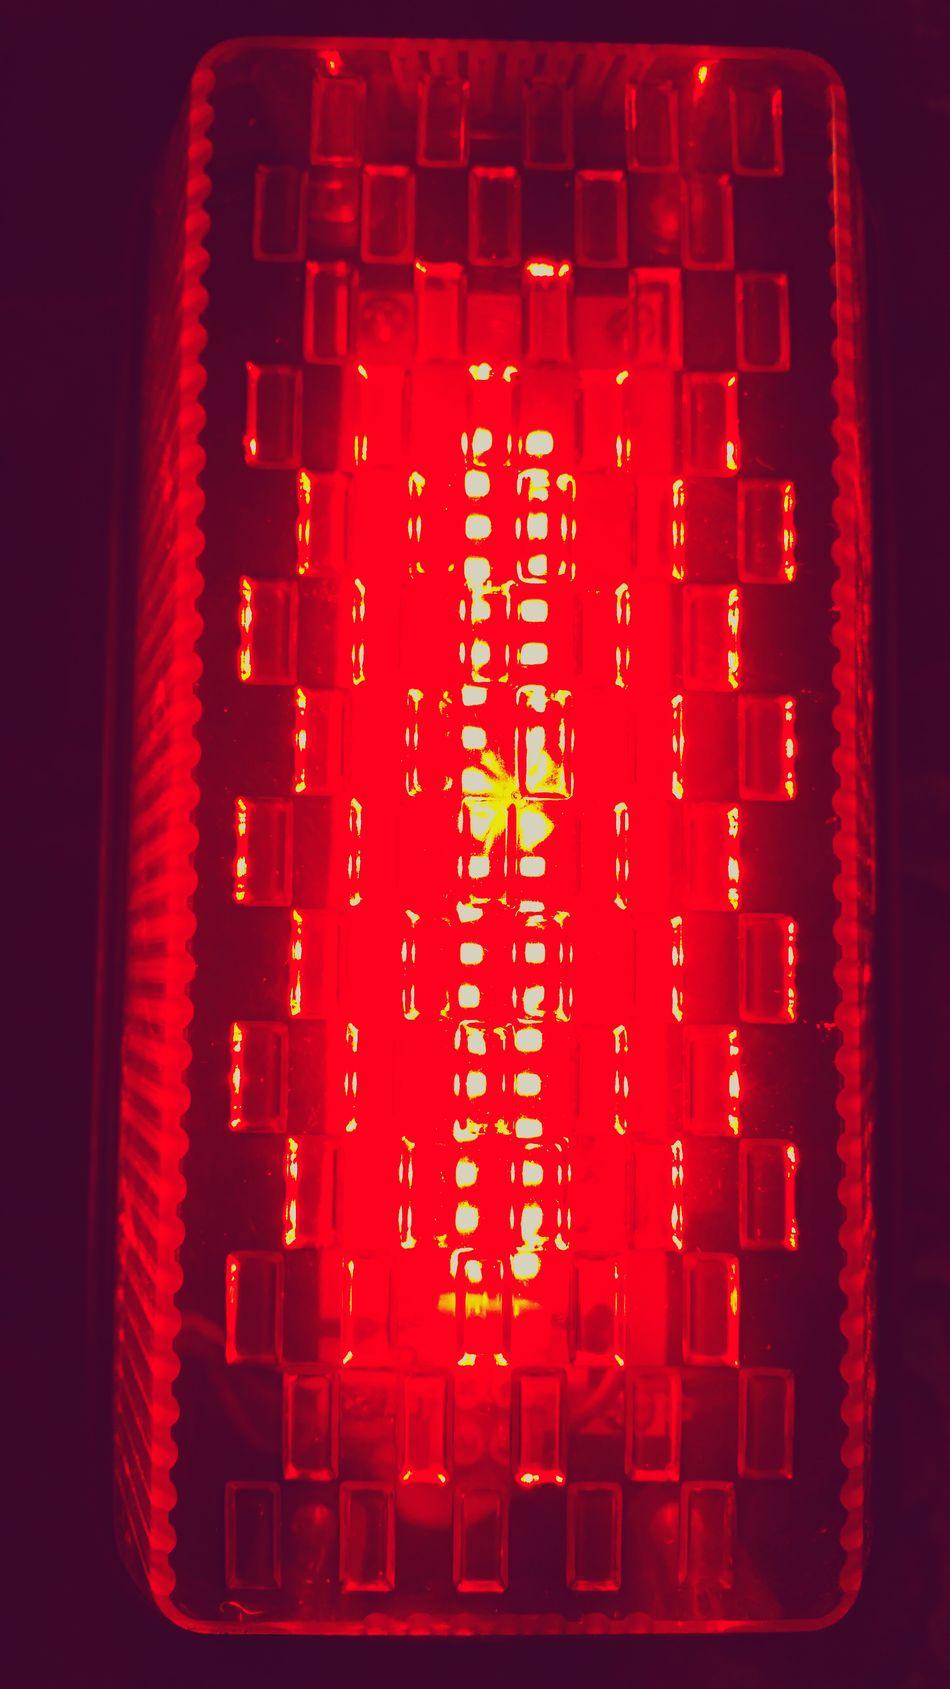 Red Light Lamp Red Light Shining Bright Colour Deep Red Red Warning Light Brake Light